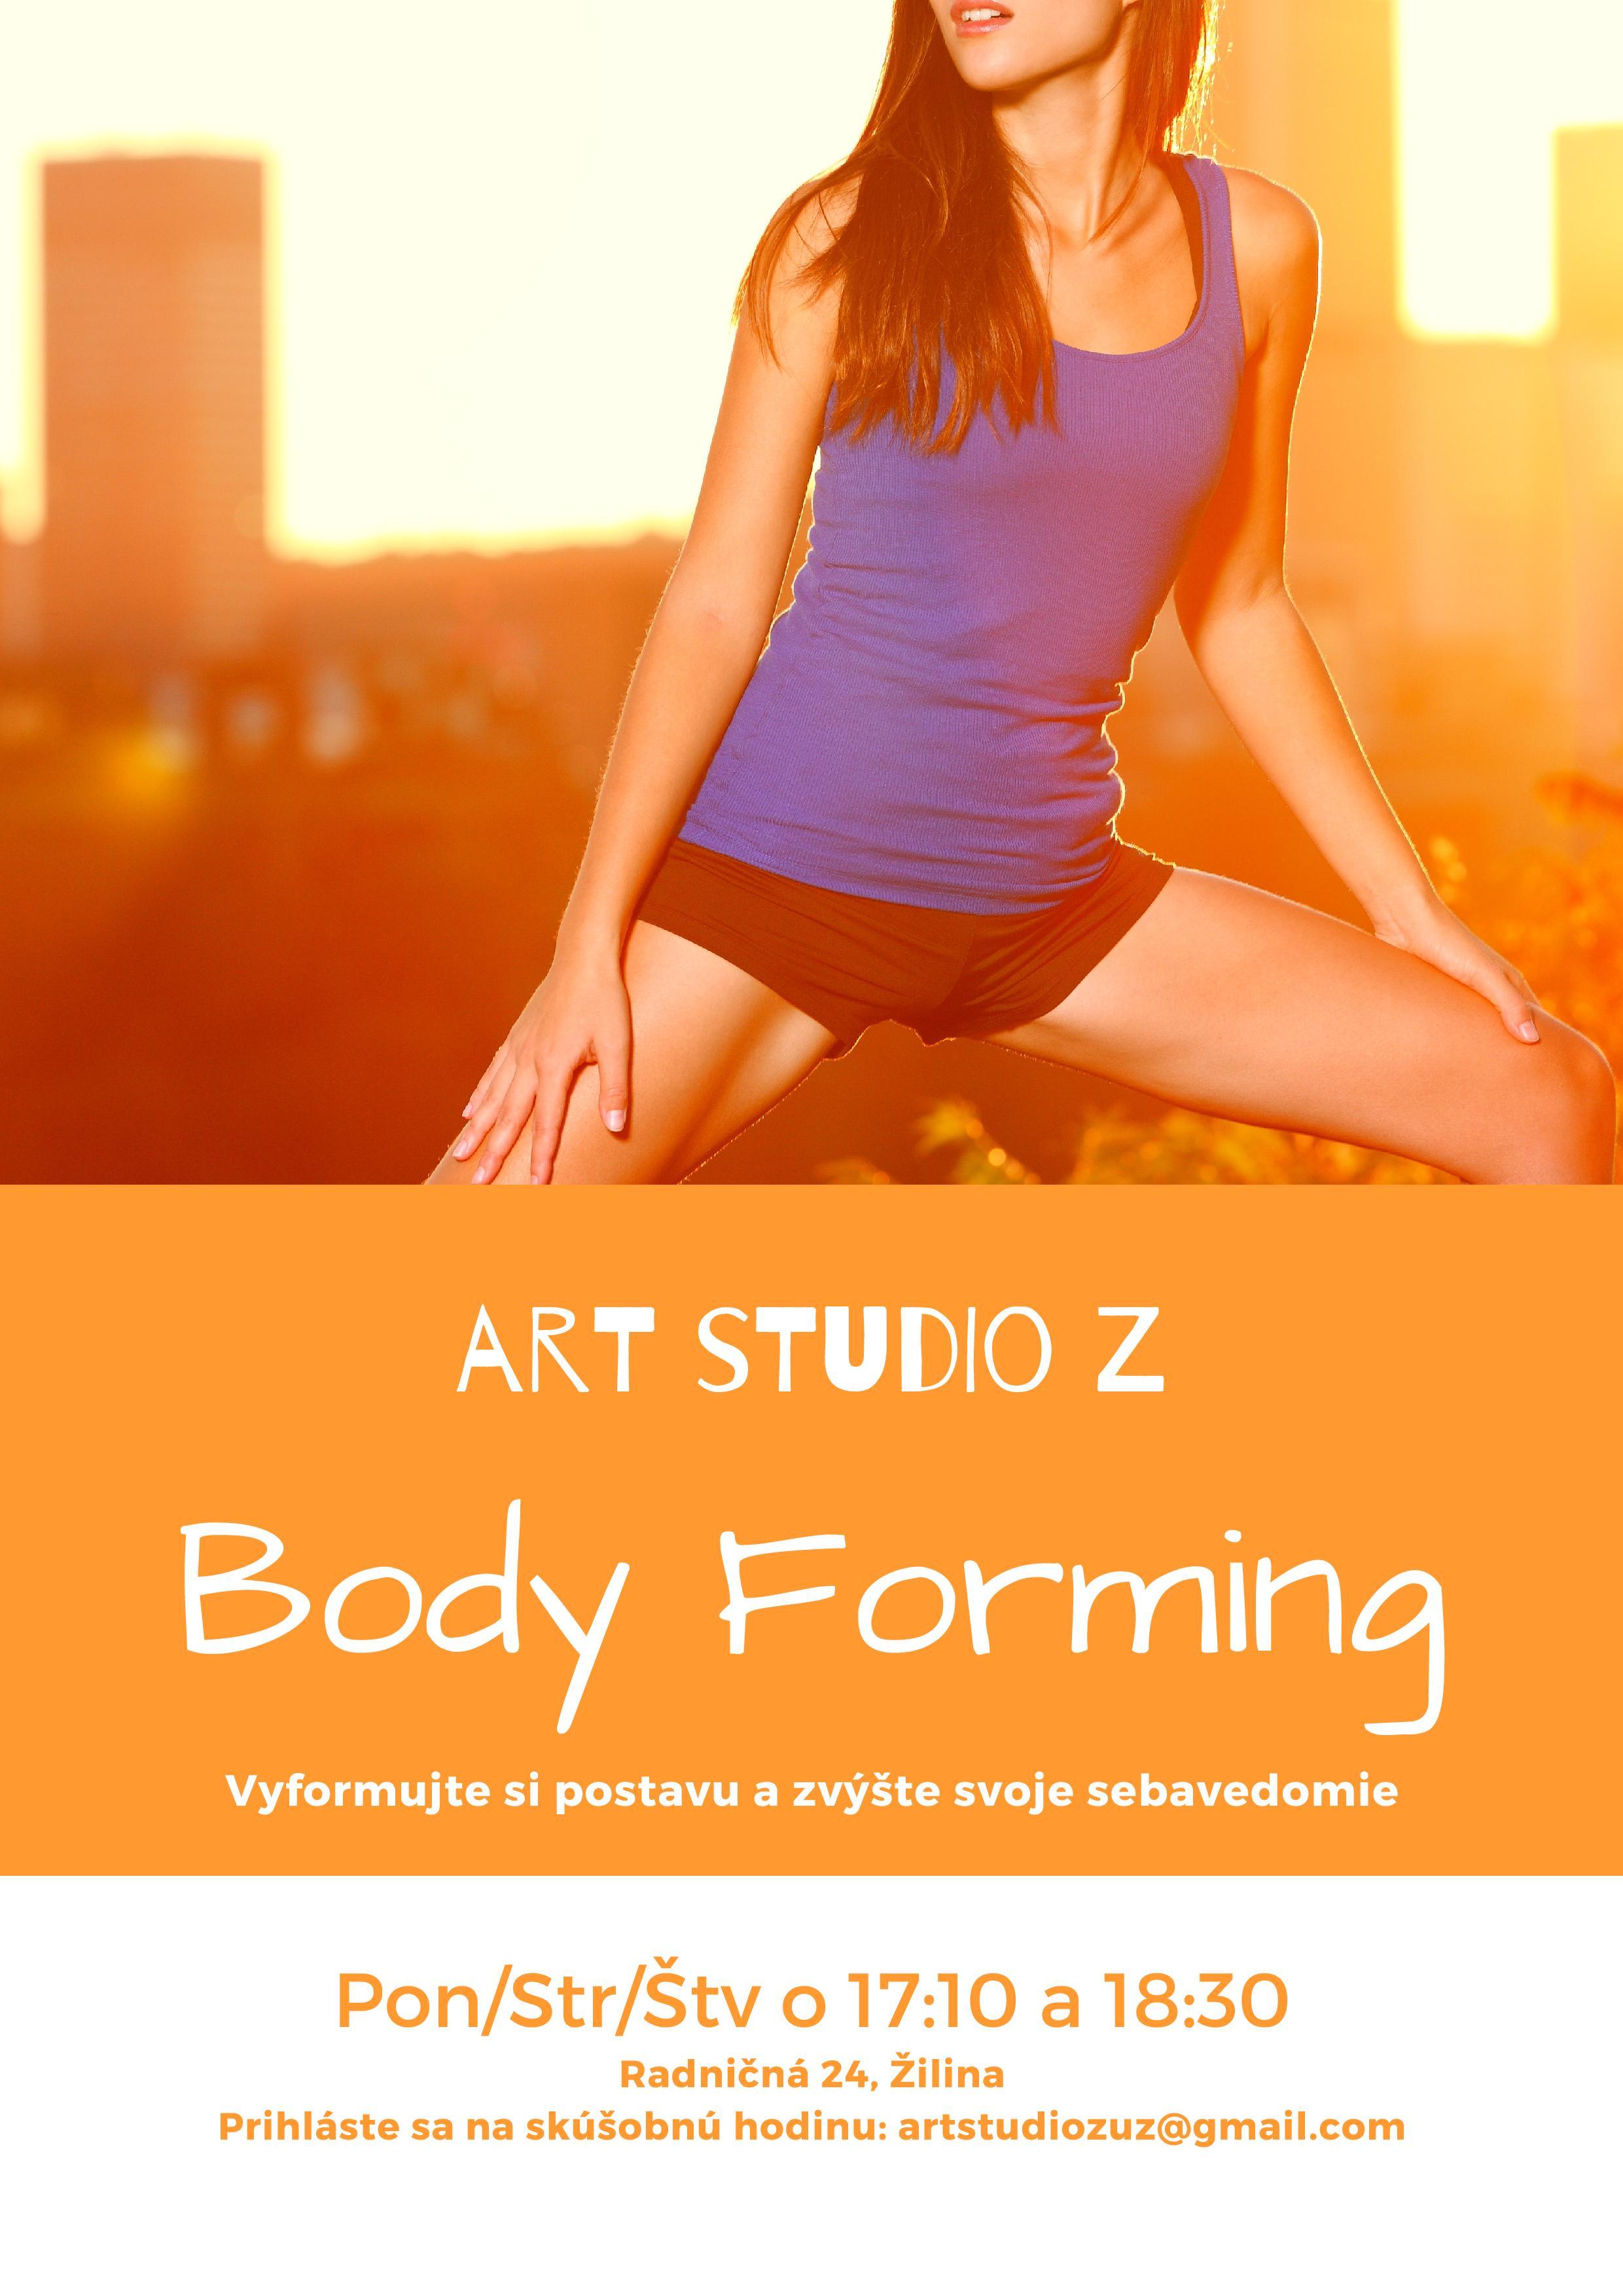 Art Studio Z - BodyForming plagát-page-001.jpg